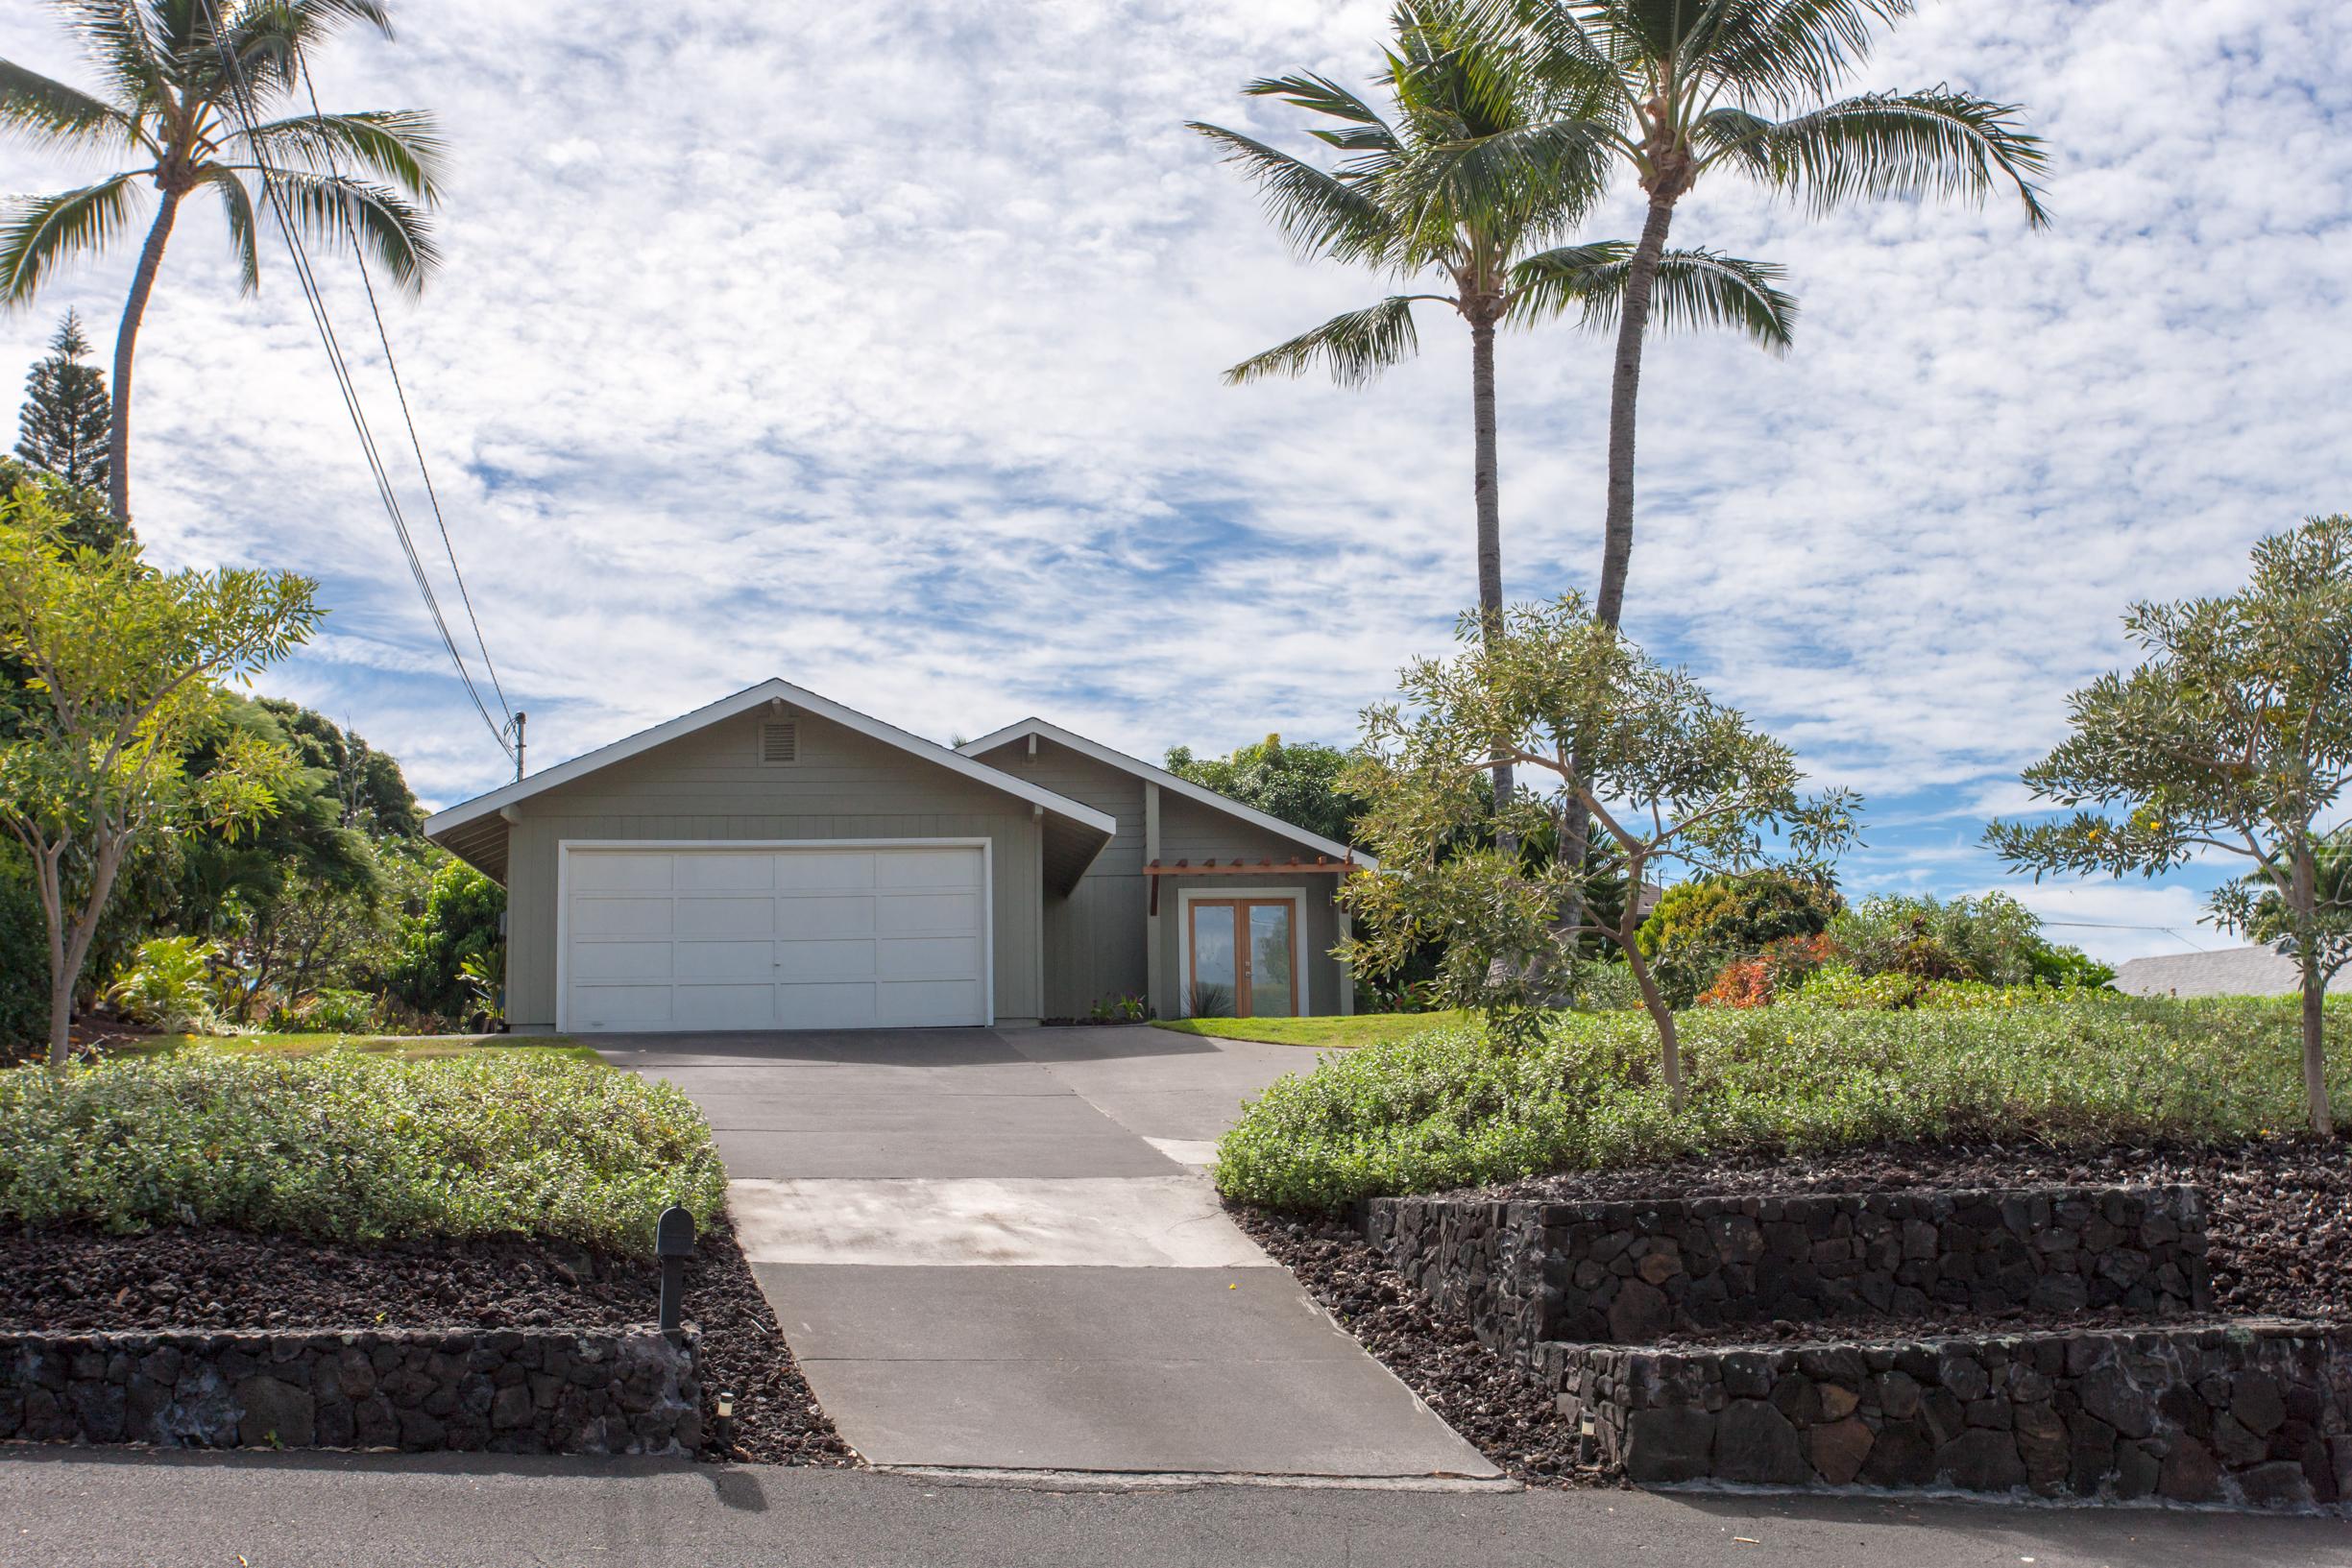 Hawaiian Real Estate  Hawaii MLS Homes amp Condos For sale